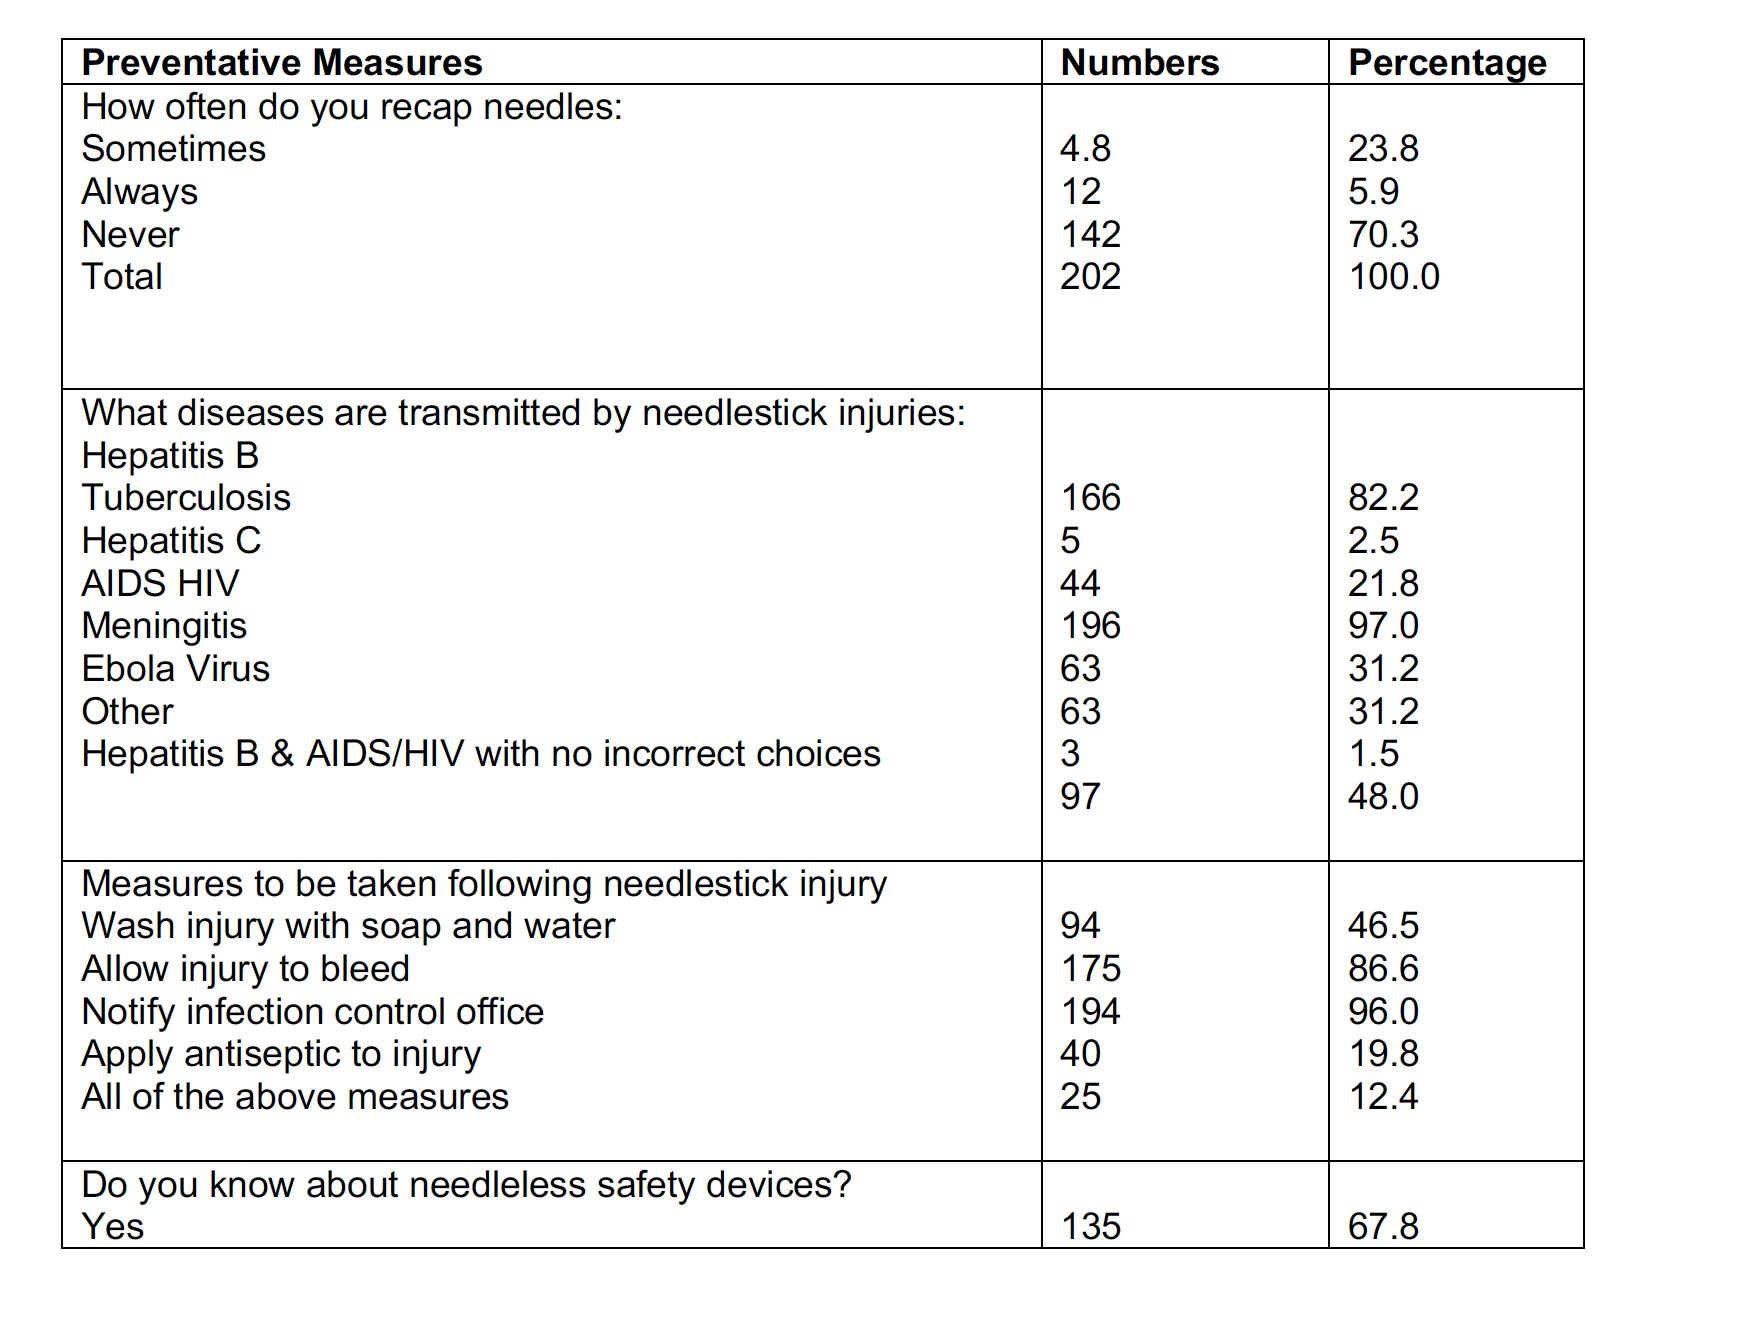 Needlestick preventative measures